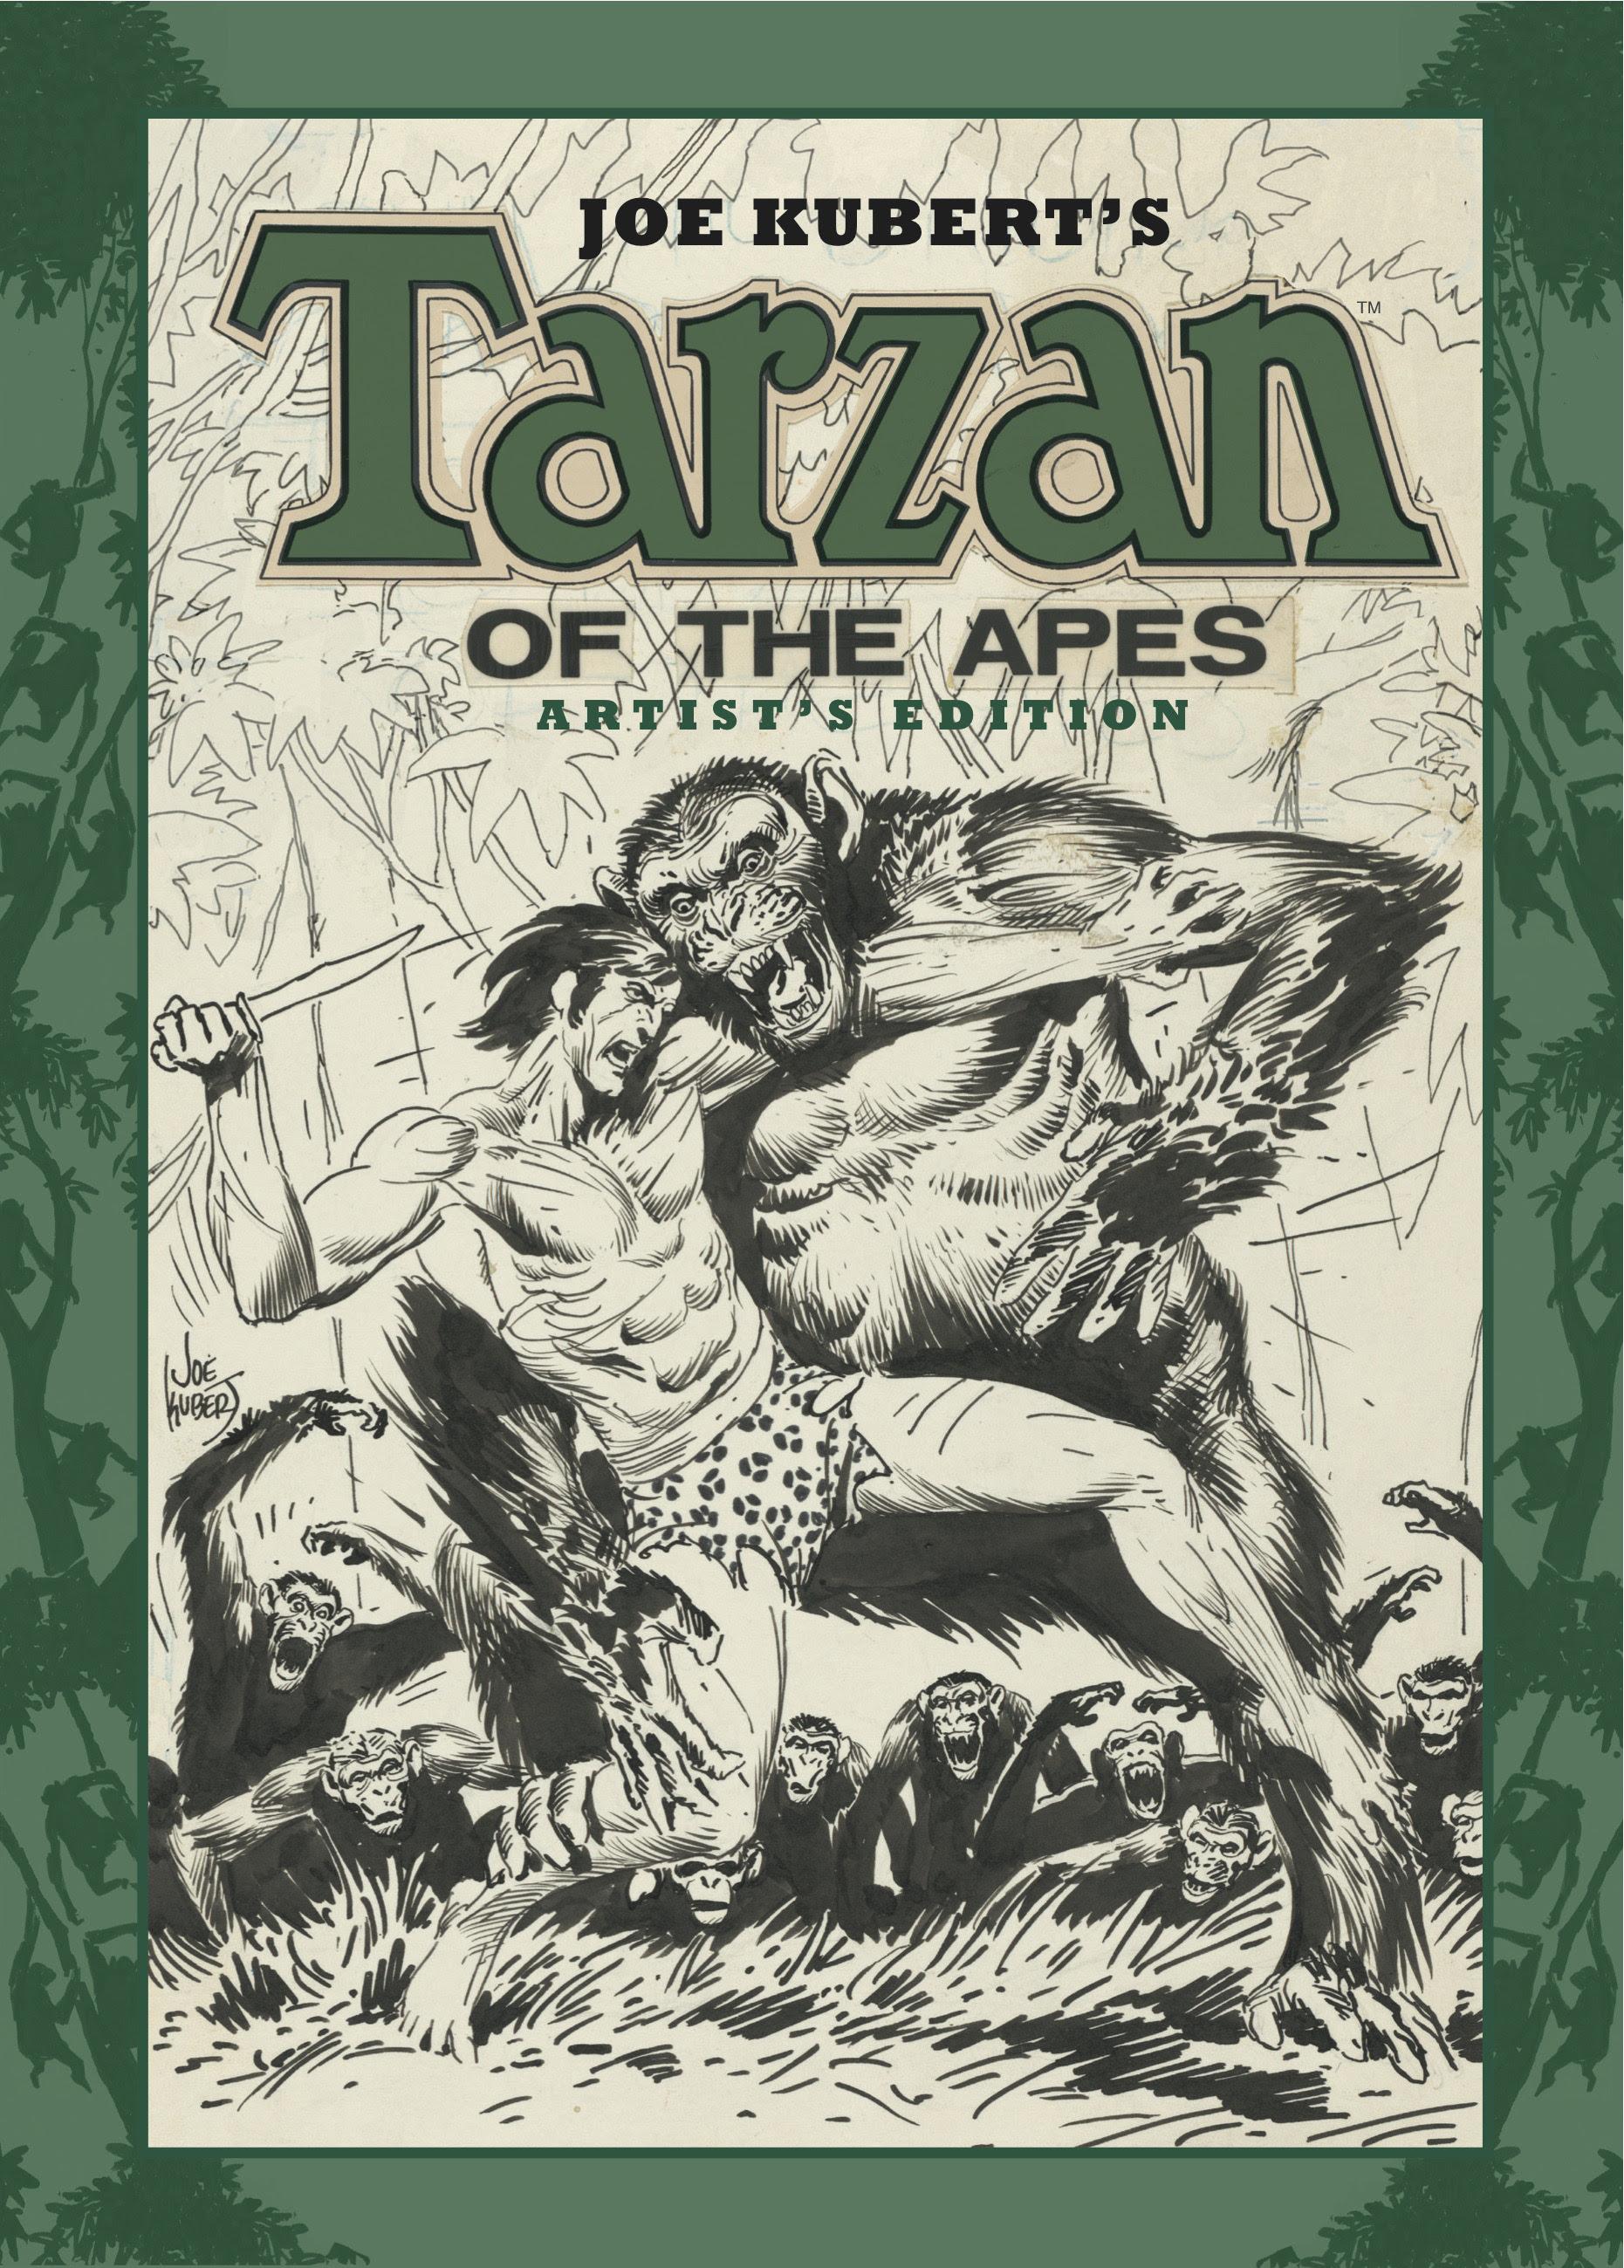 [Tarzan Artist Edition Cover]